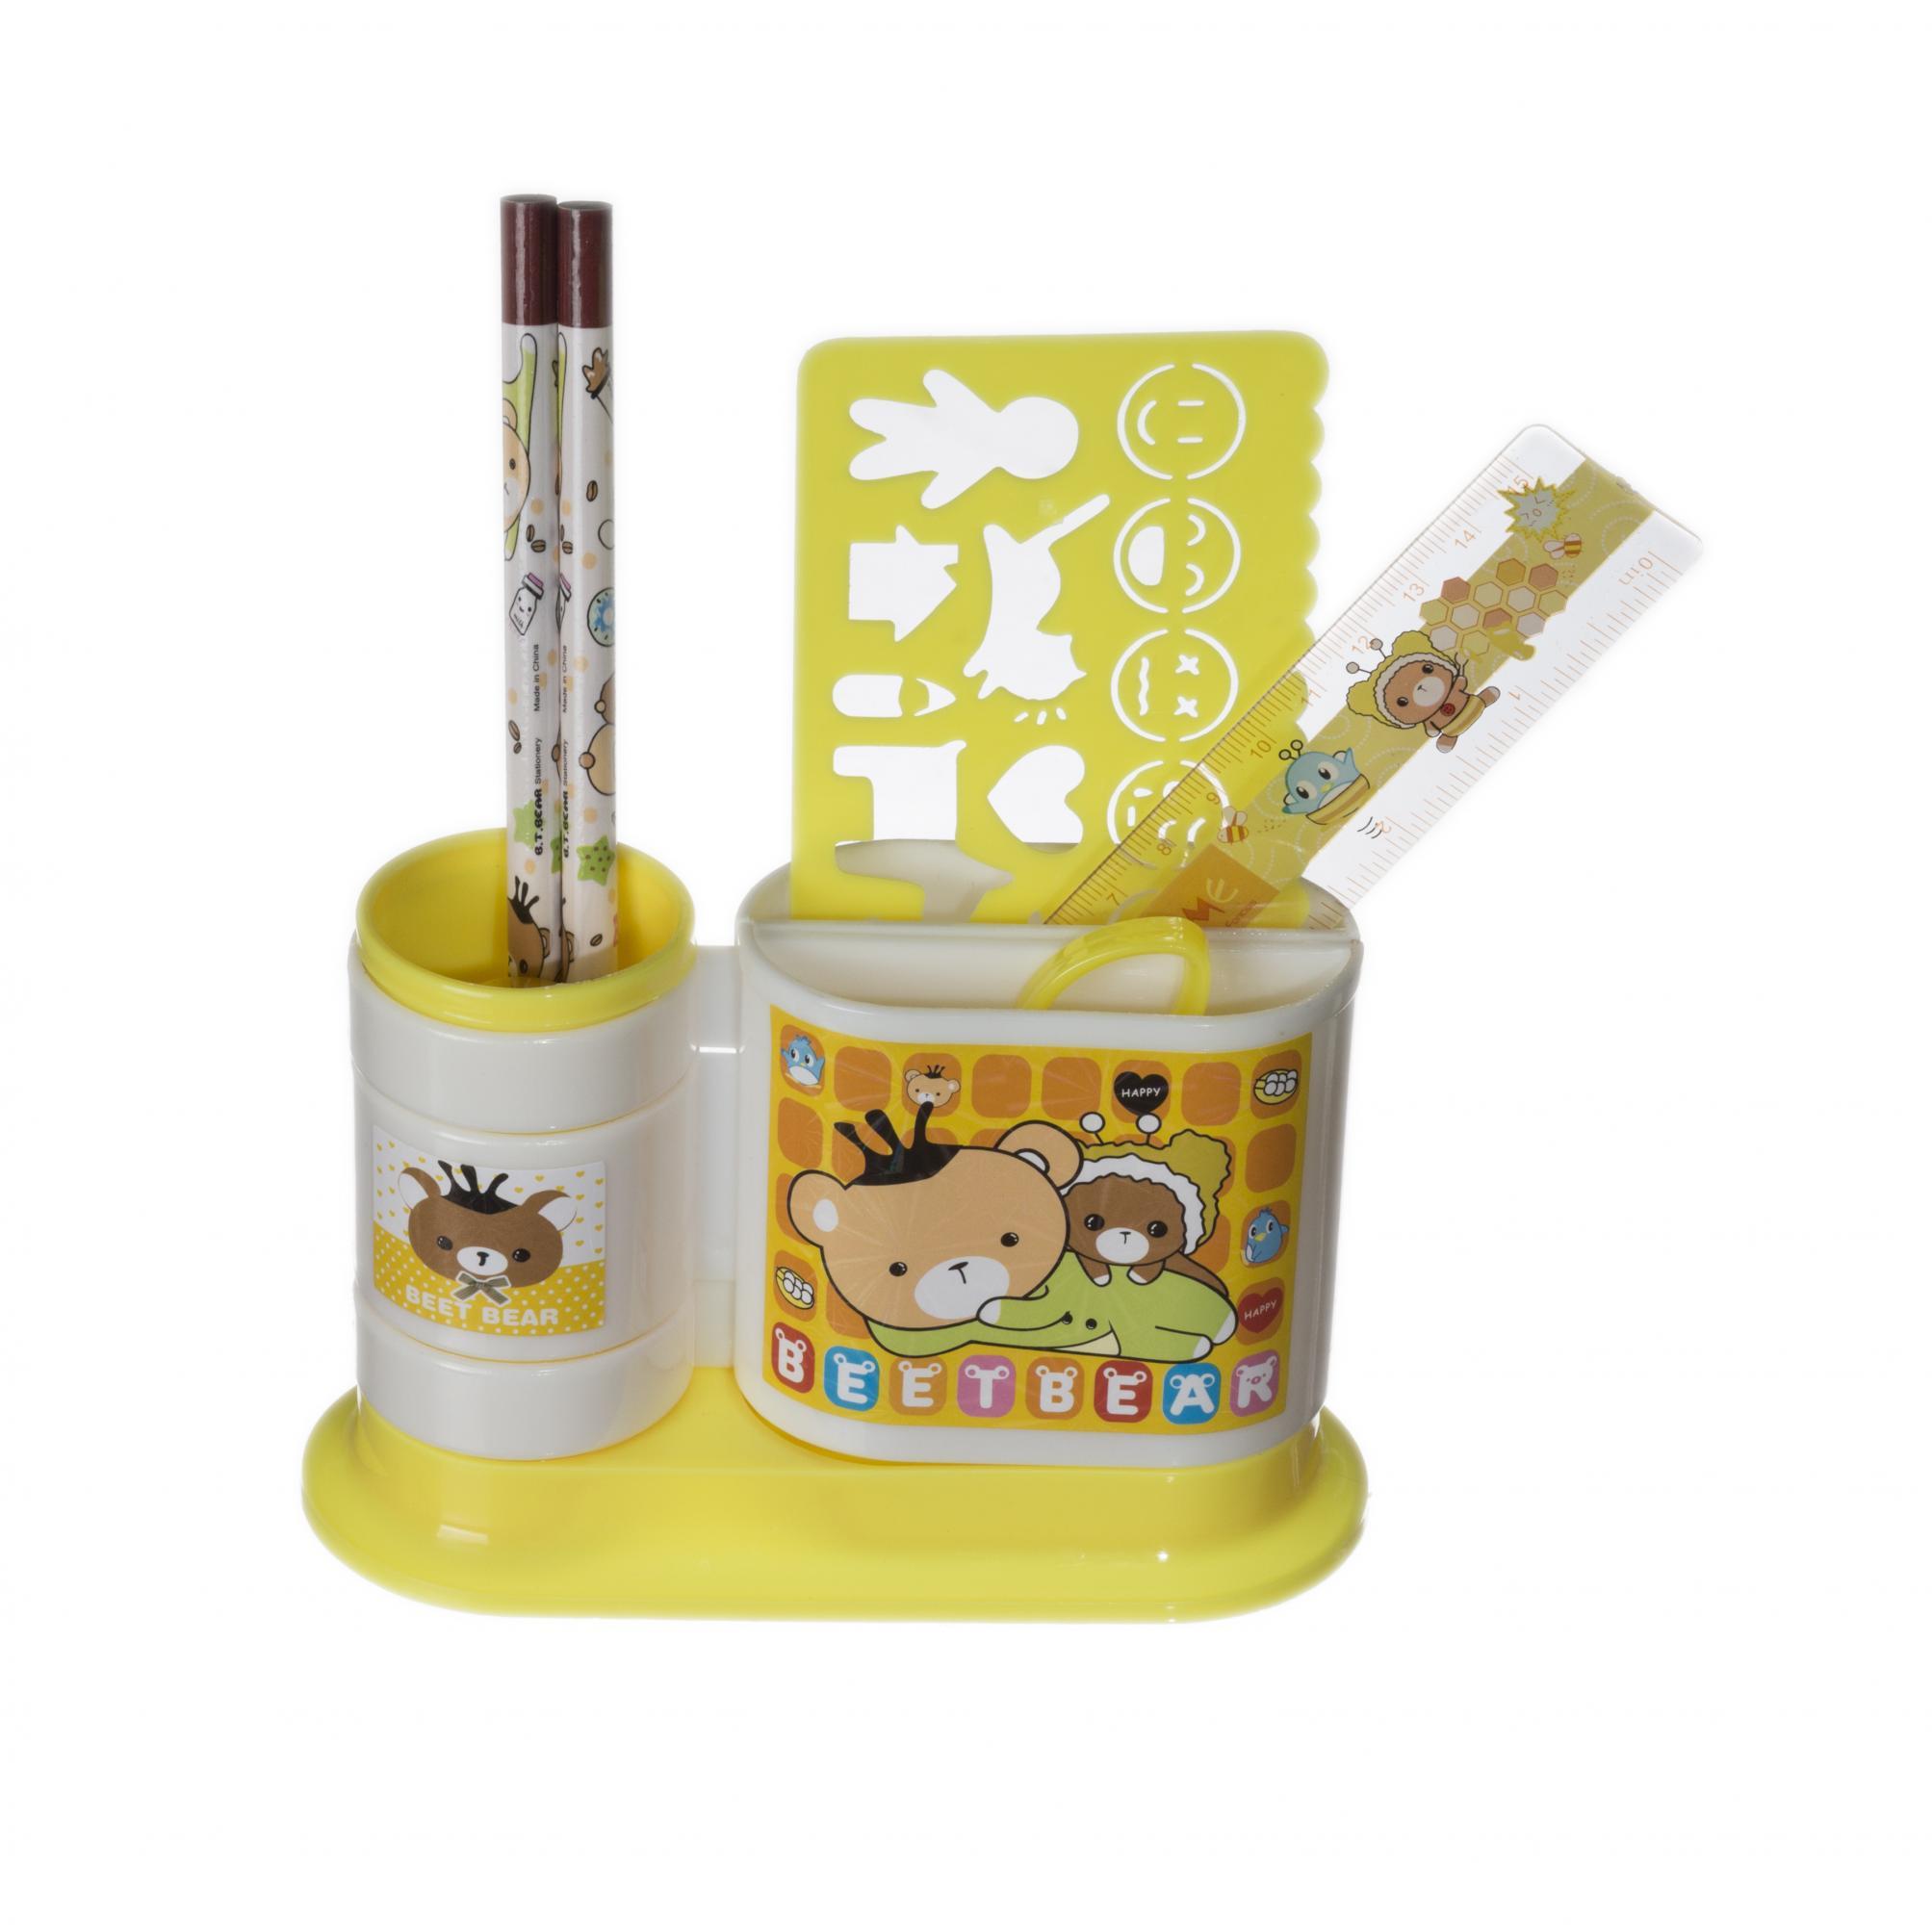 Набор канцтоваров подарочный EVO ЖелтыйАксессуары<br><br>Цвет: Желтый; Бренд: Mealux;